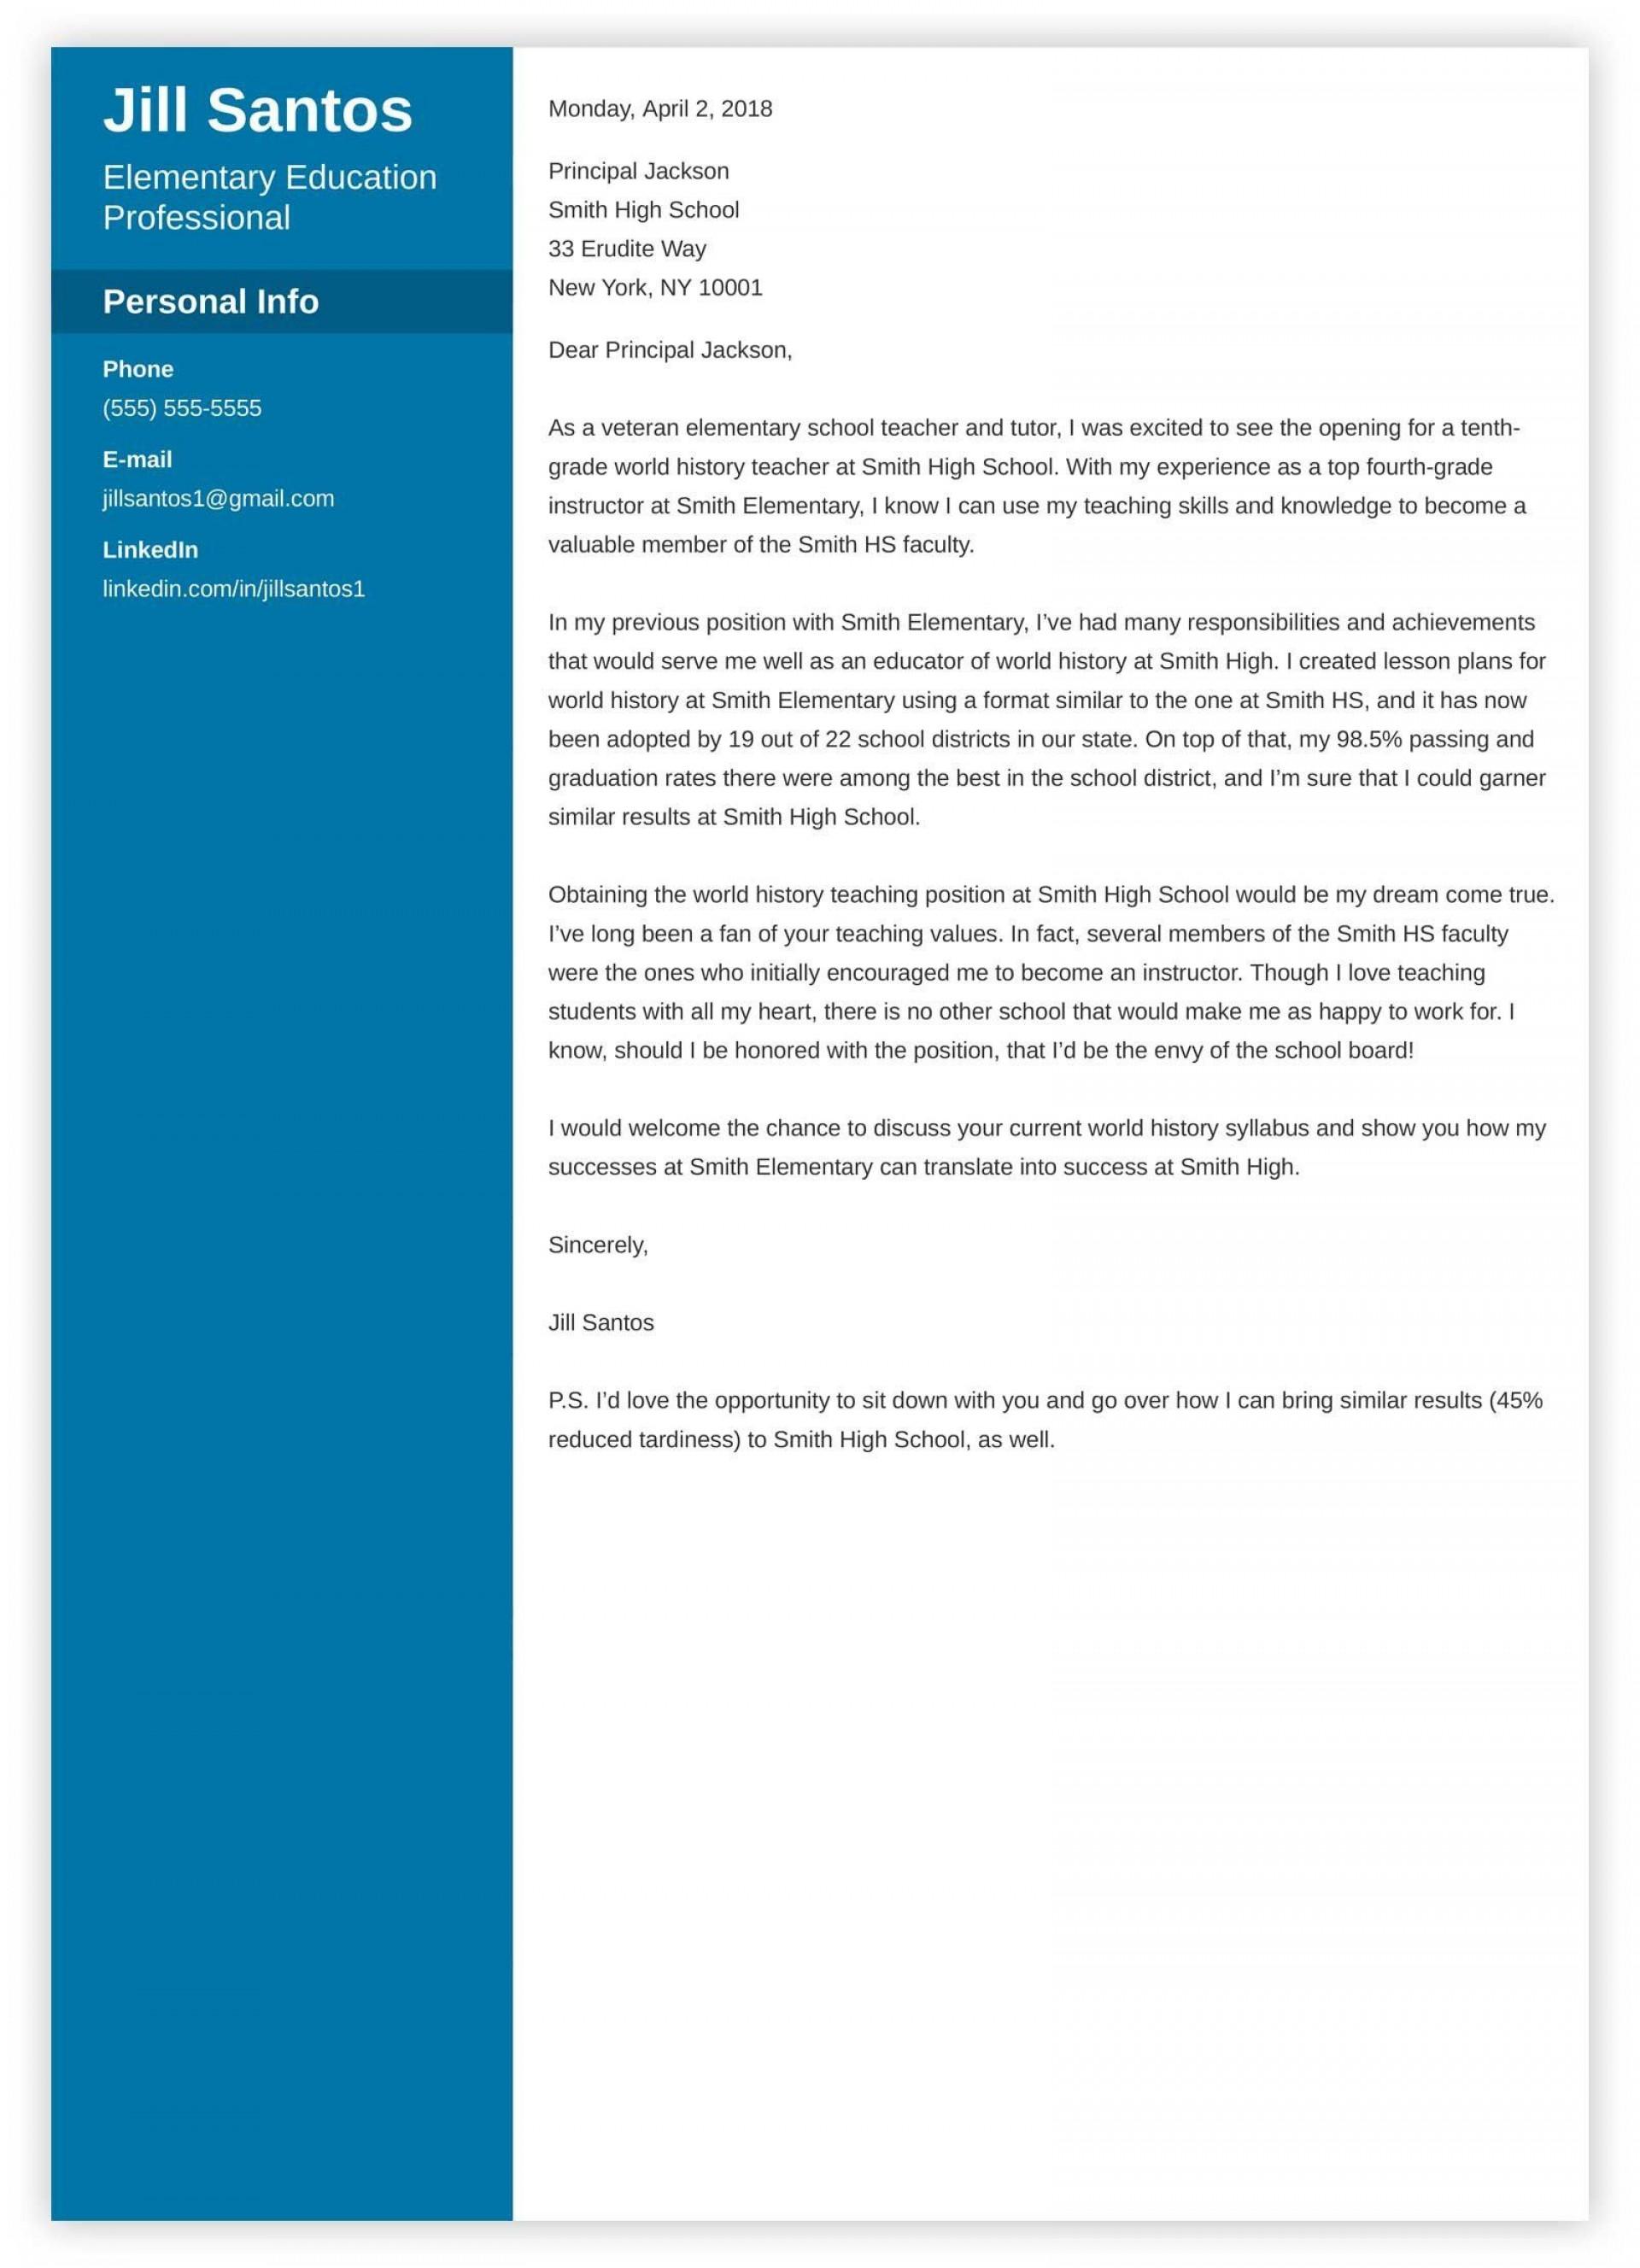 009 Wondrou Teacher Cover Letter Template Idea  Teaching Job1920